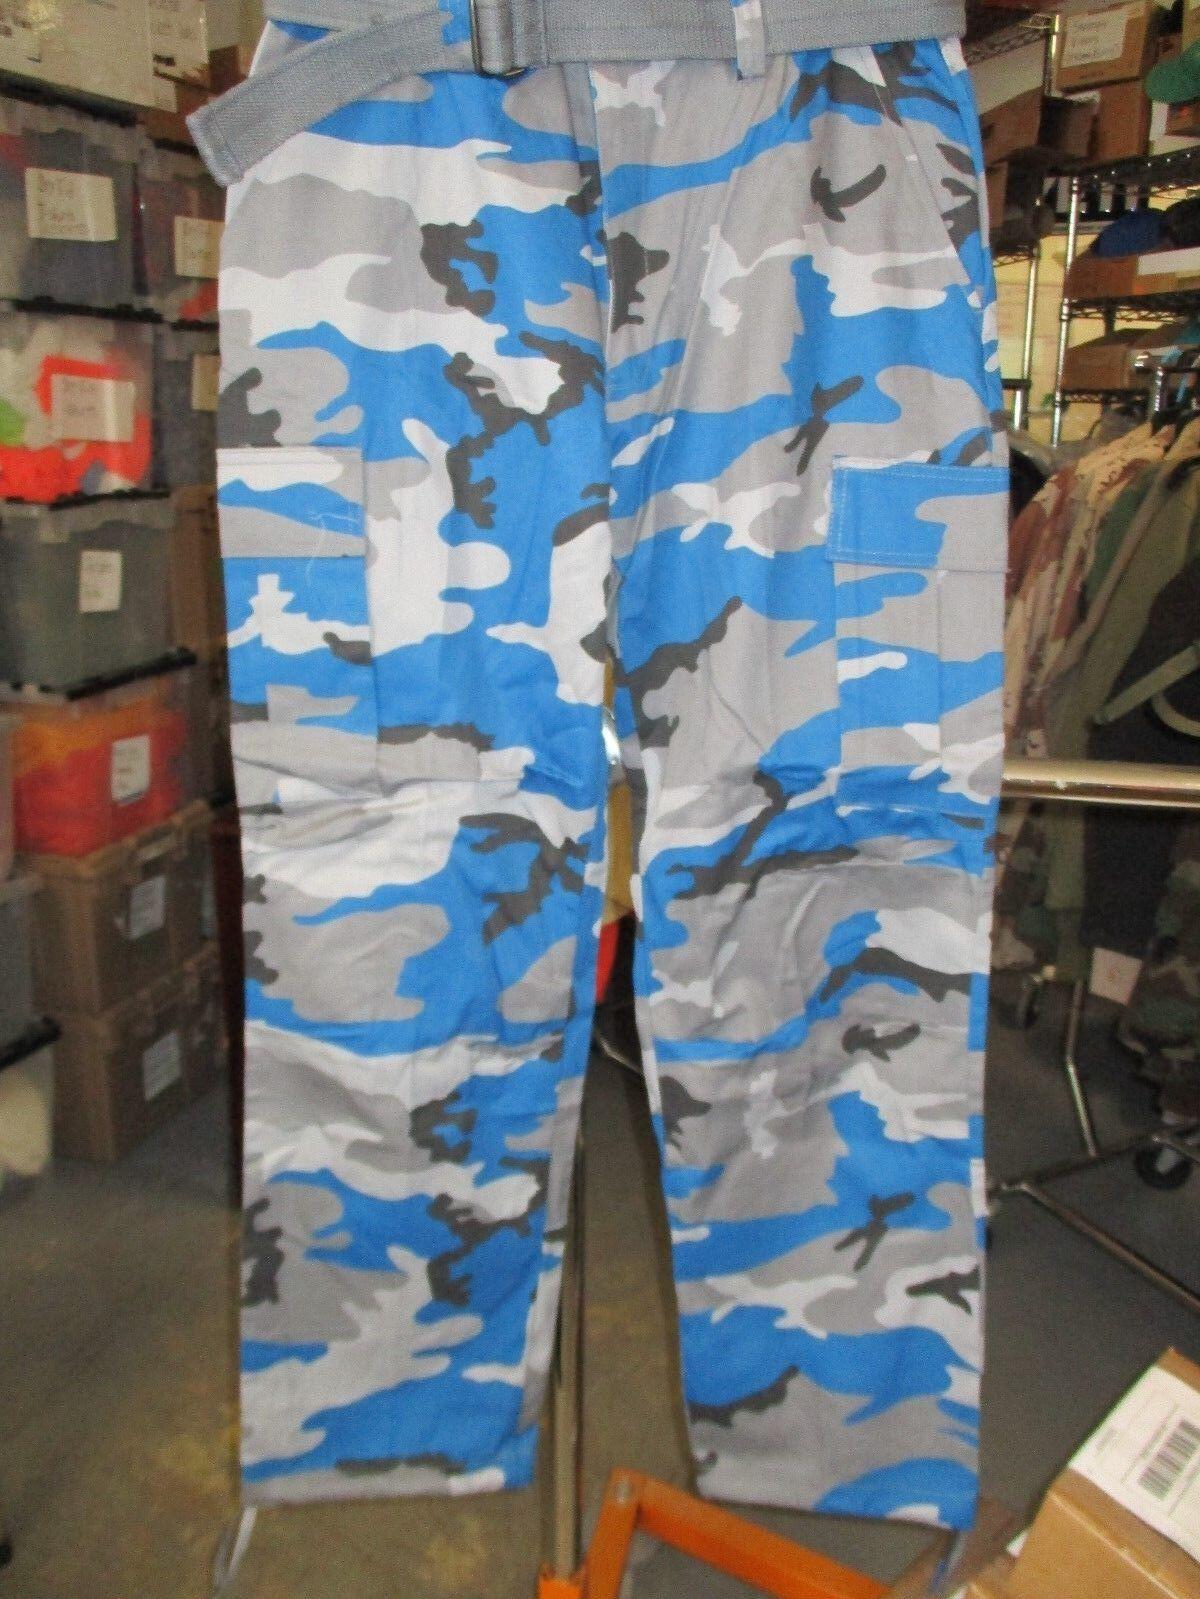 NEW-1-REGAL WEAR CARGO PANTS TROUSERS STYLE 6CP01 TEAL CAMO -W-36 -L-32[BLKBX002